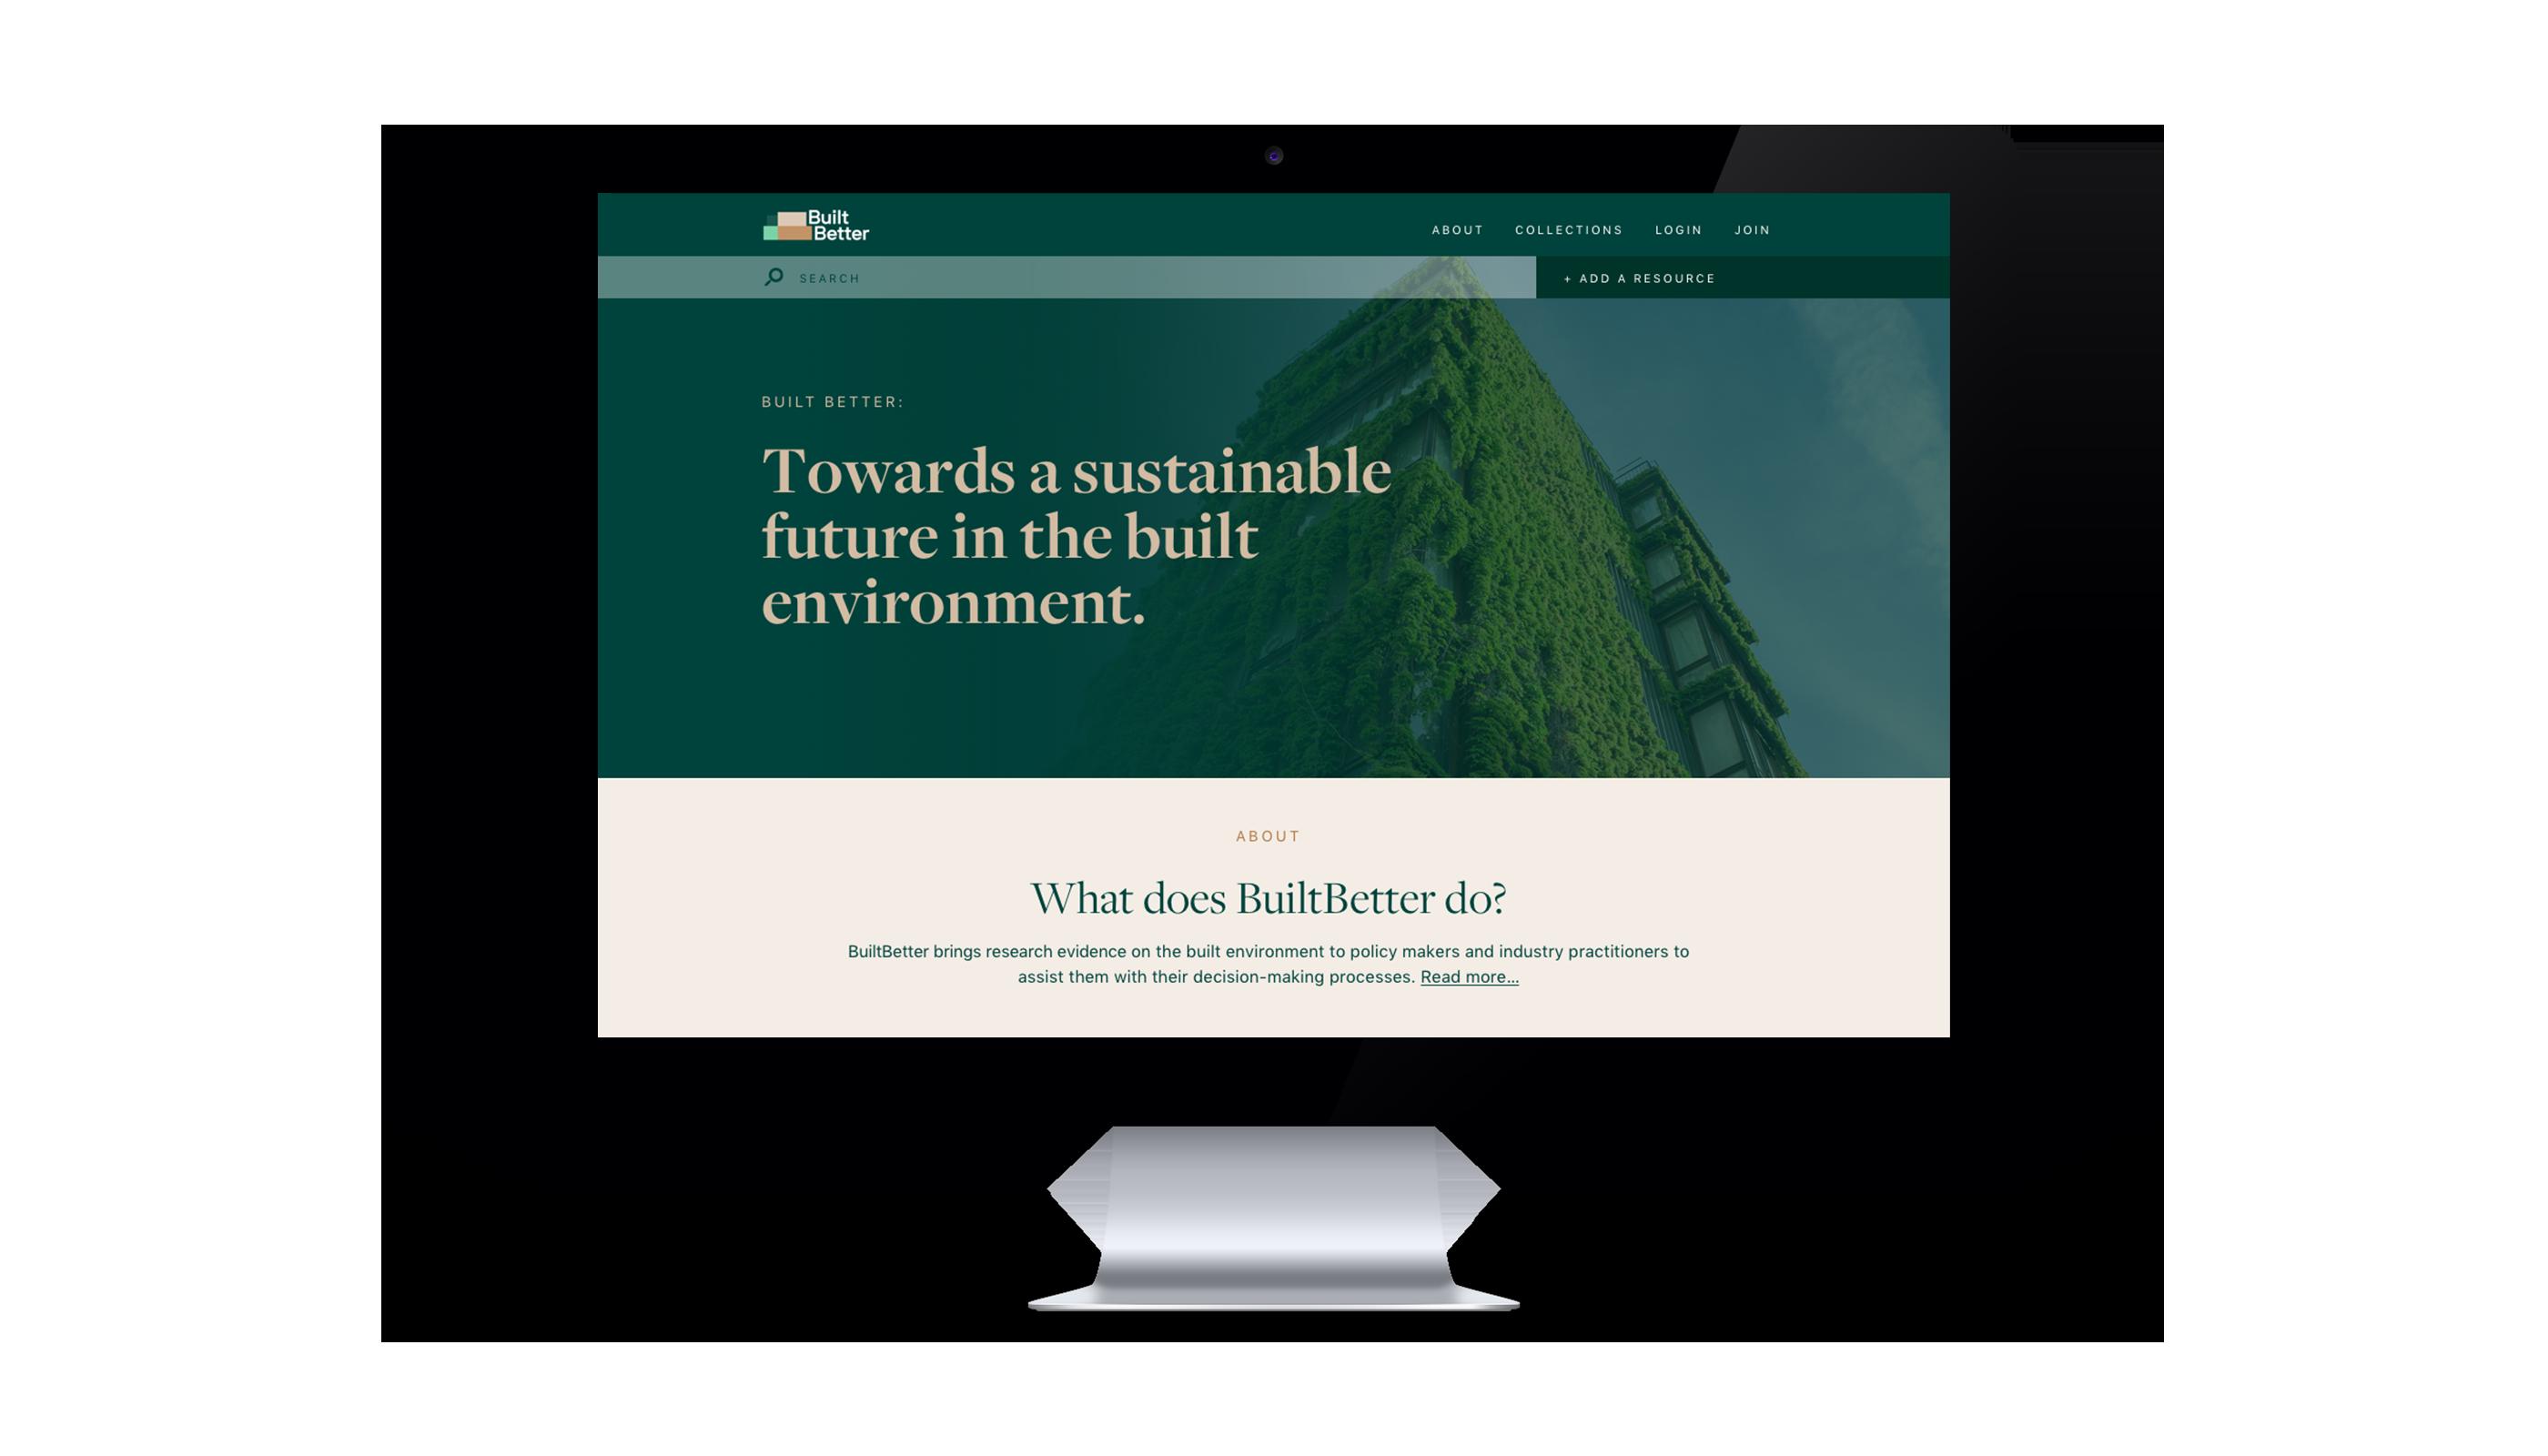 BuiltBetter website landing page on a computer screen